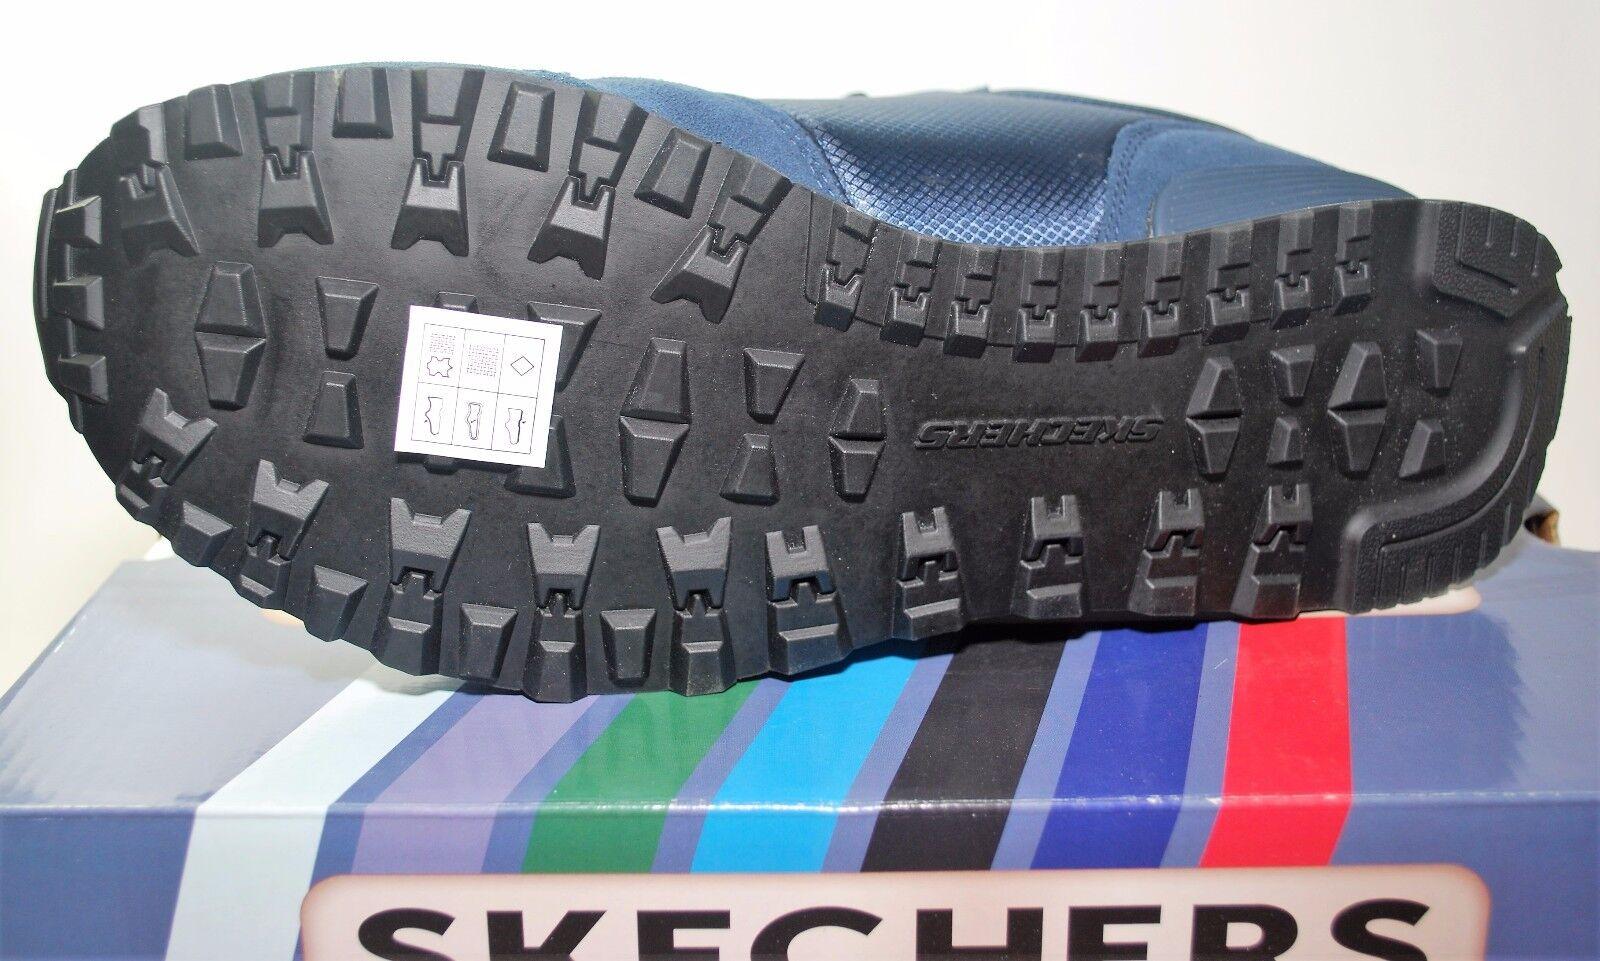 SKECHERS Uomo OG 85 Early Grab Grab Grab - Navy/Grey Width Med FASHION Running SZ 9.5 550df4